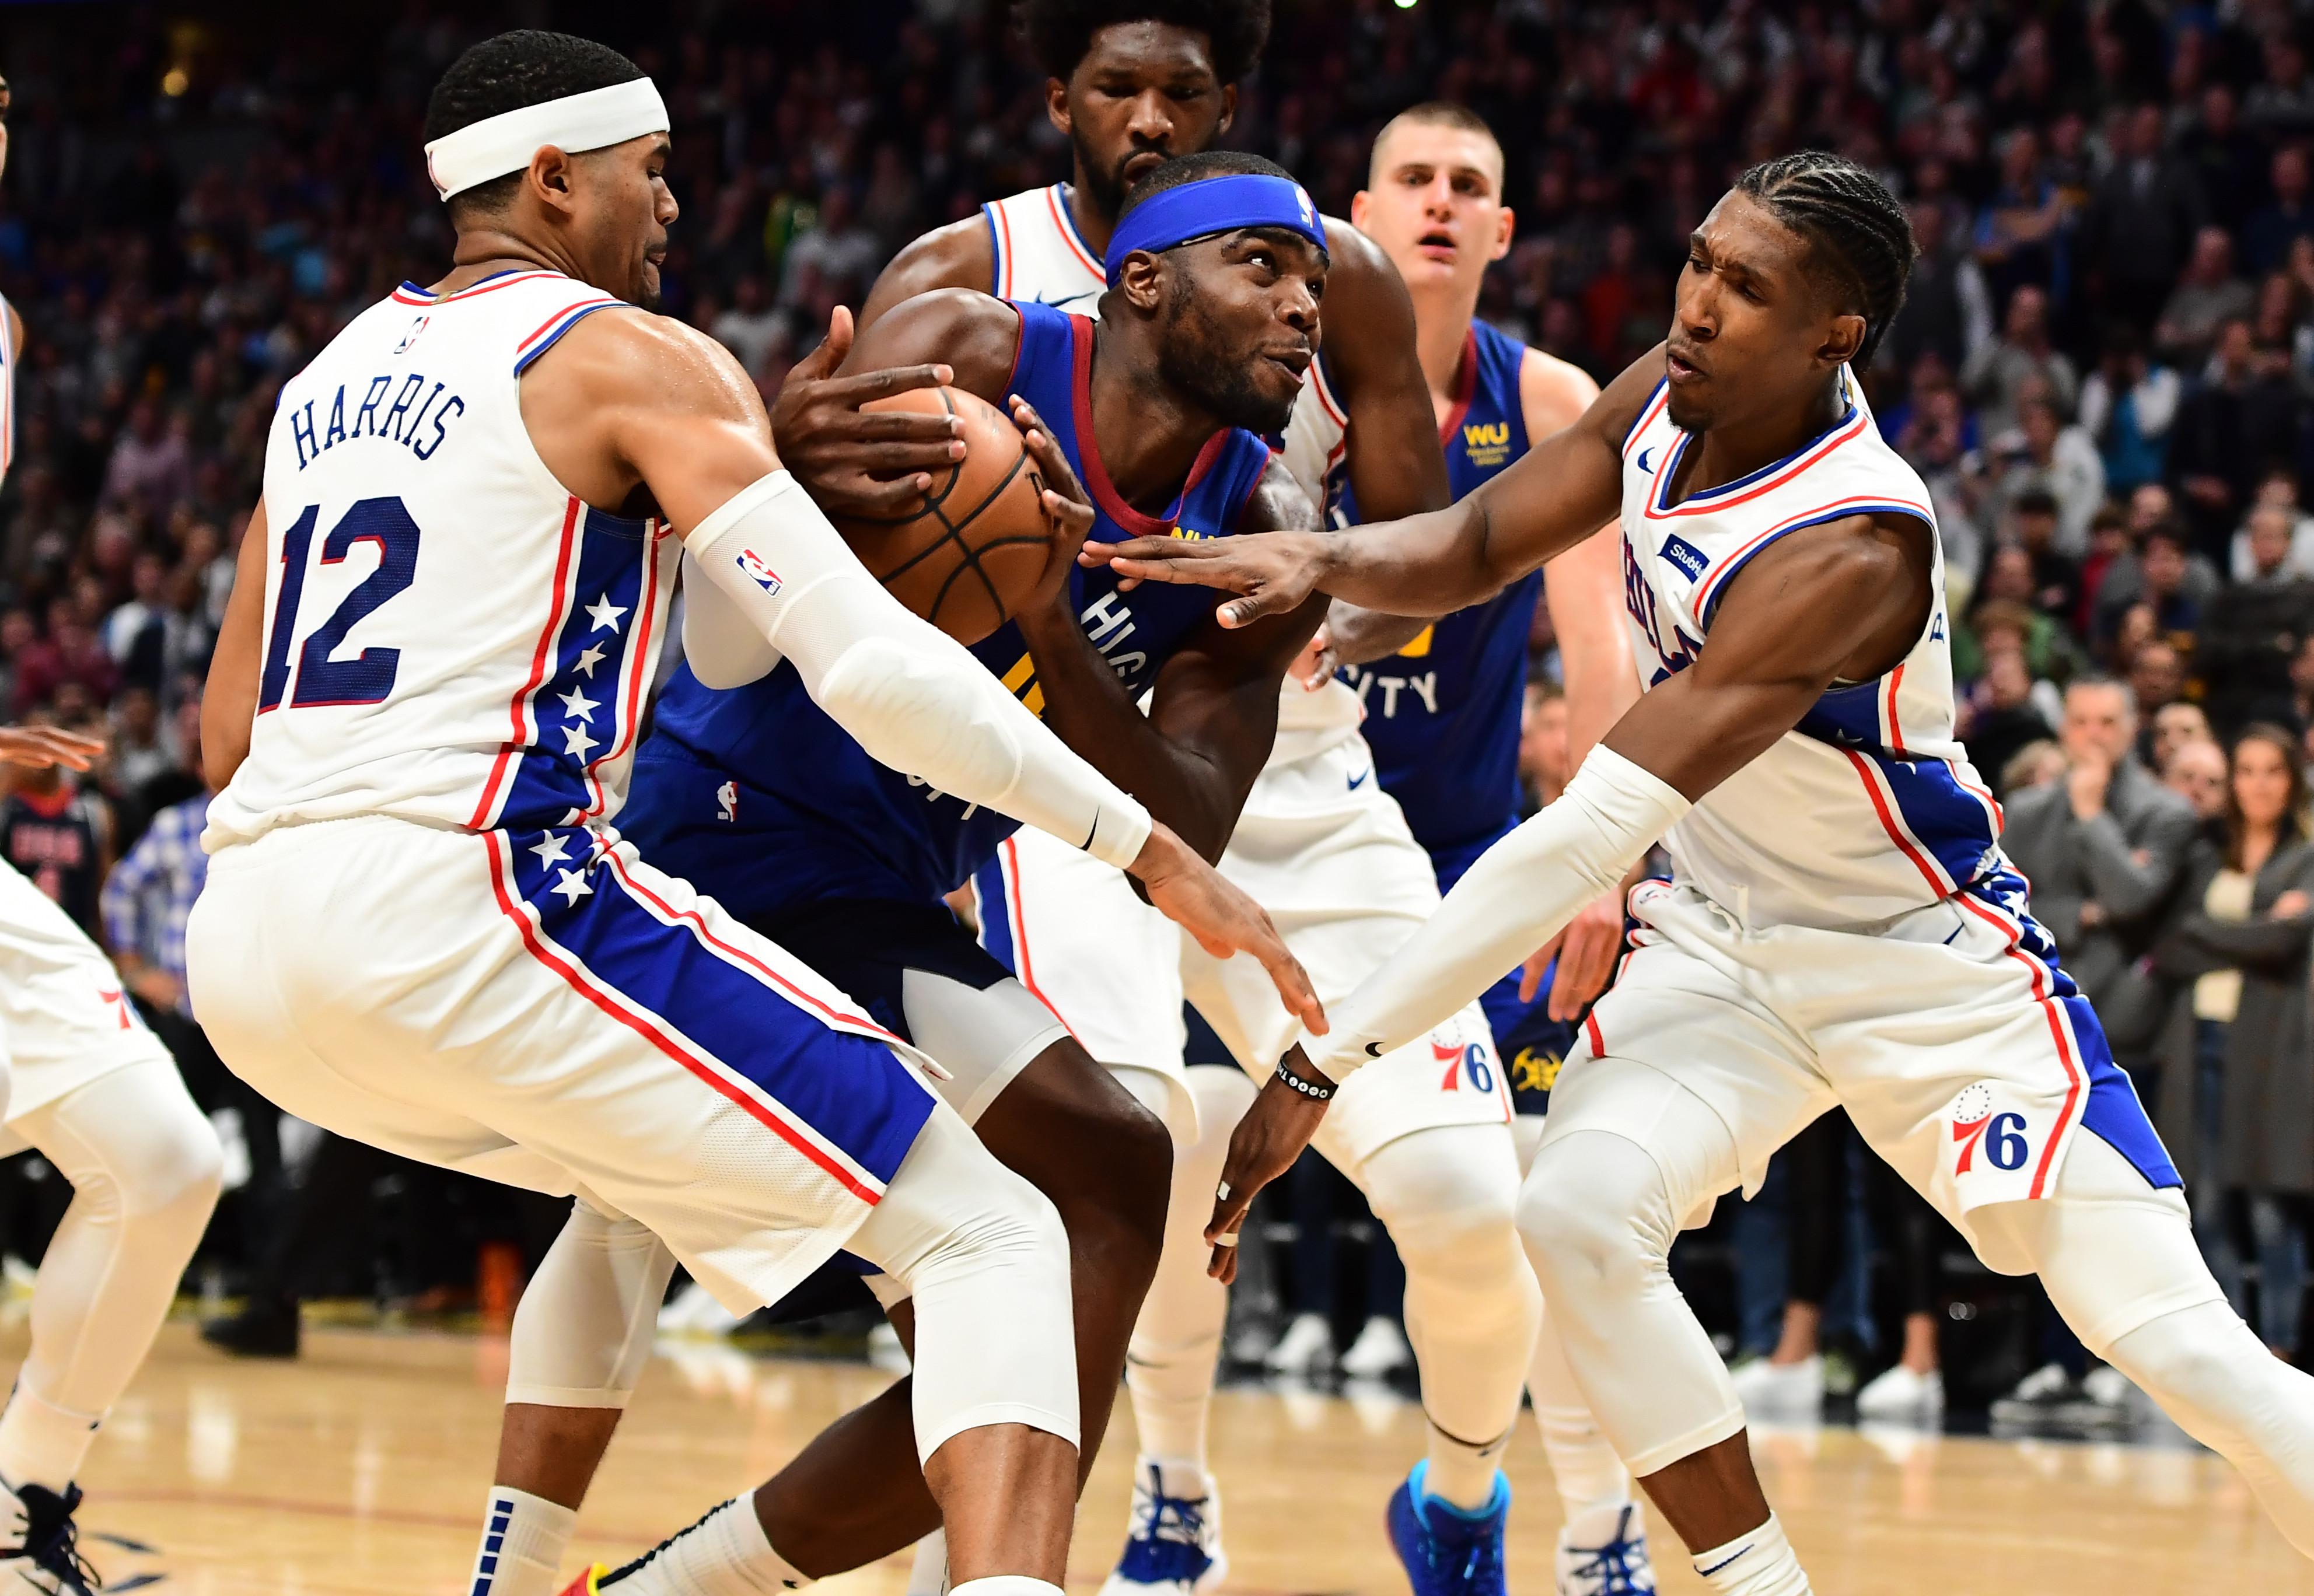 NBA: Philadelphia 76ers at Denver Nuggets